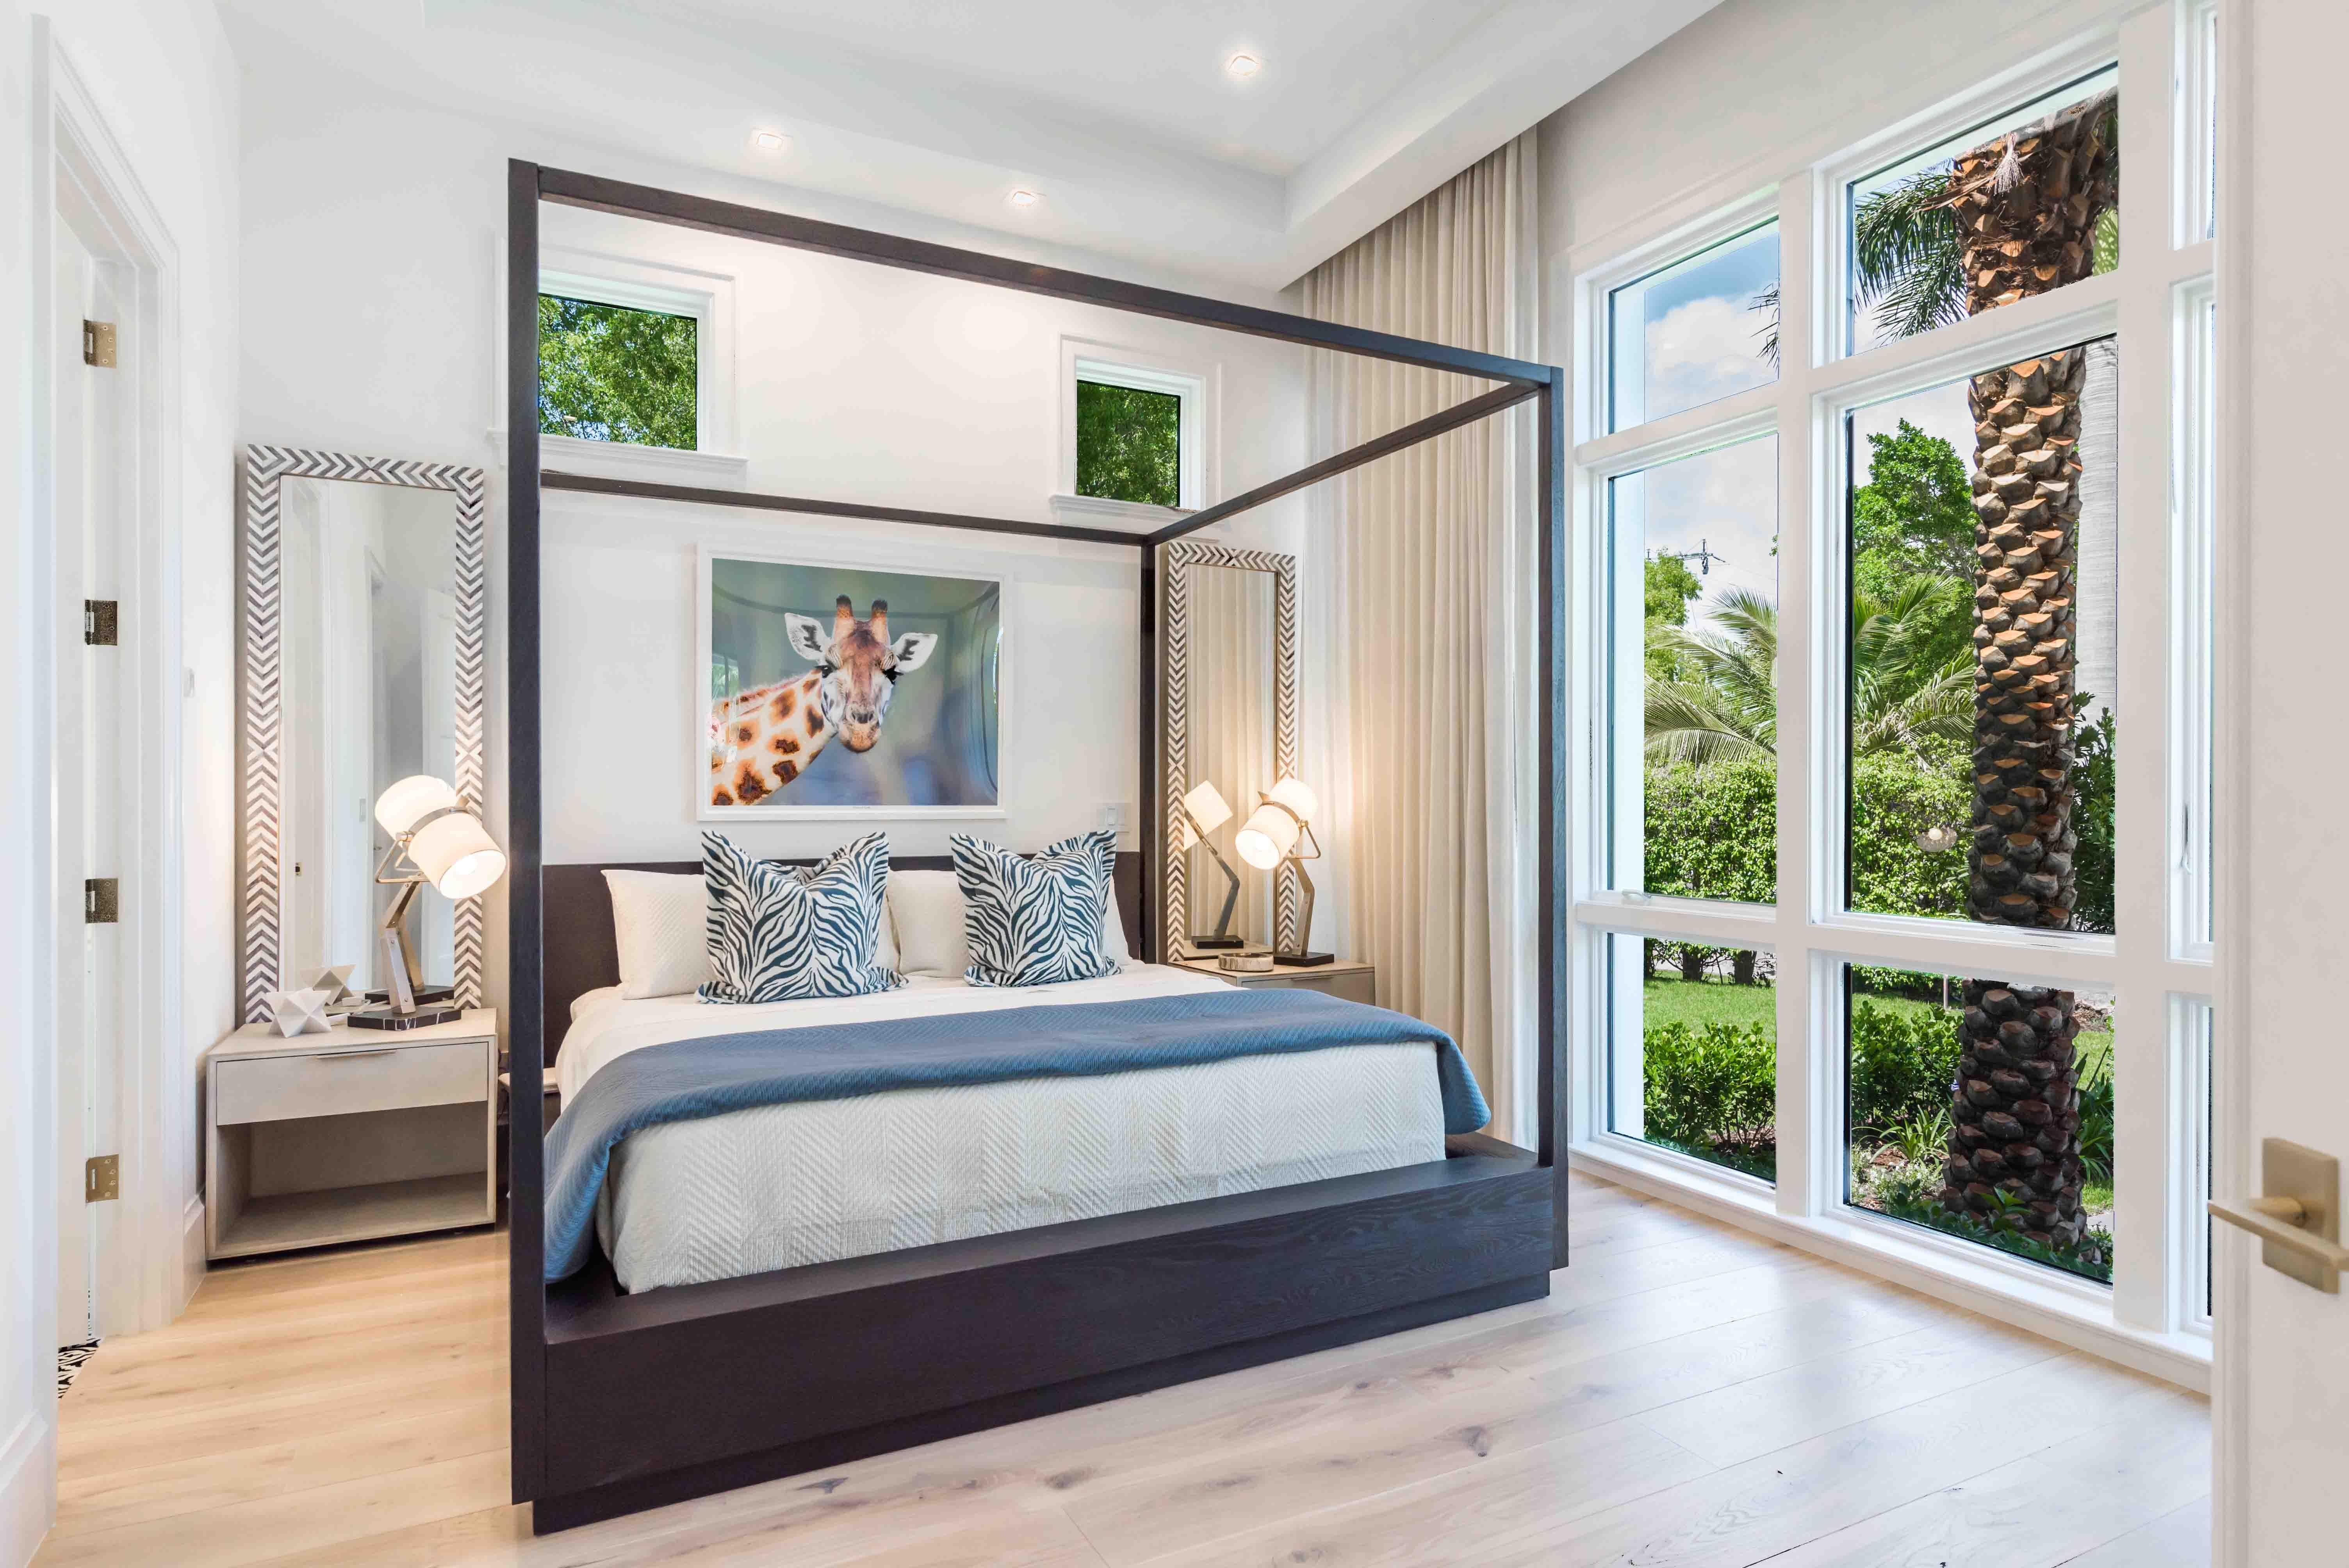 Jeffrey Fisher Home Luxury Interior Design Imagined Home Decor Custom Bedroom Design